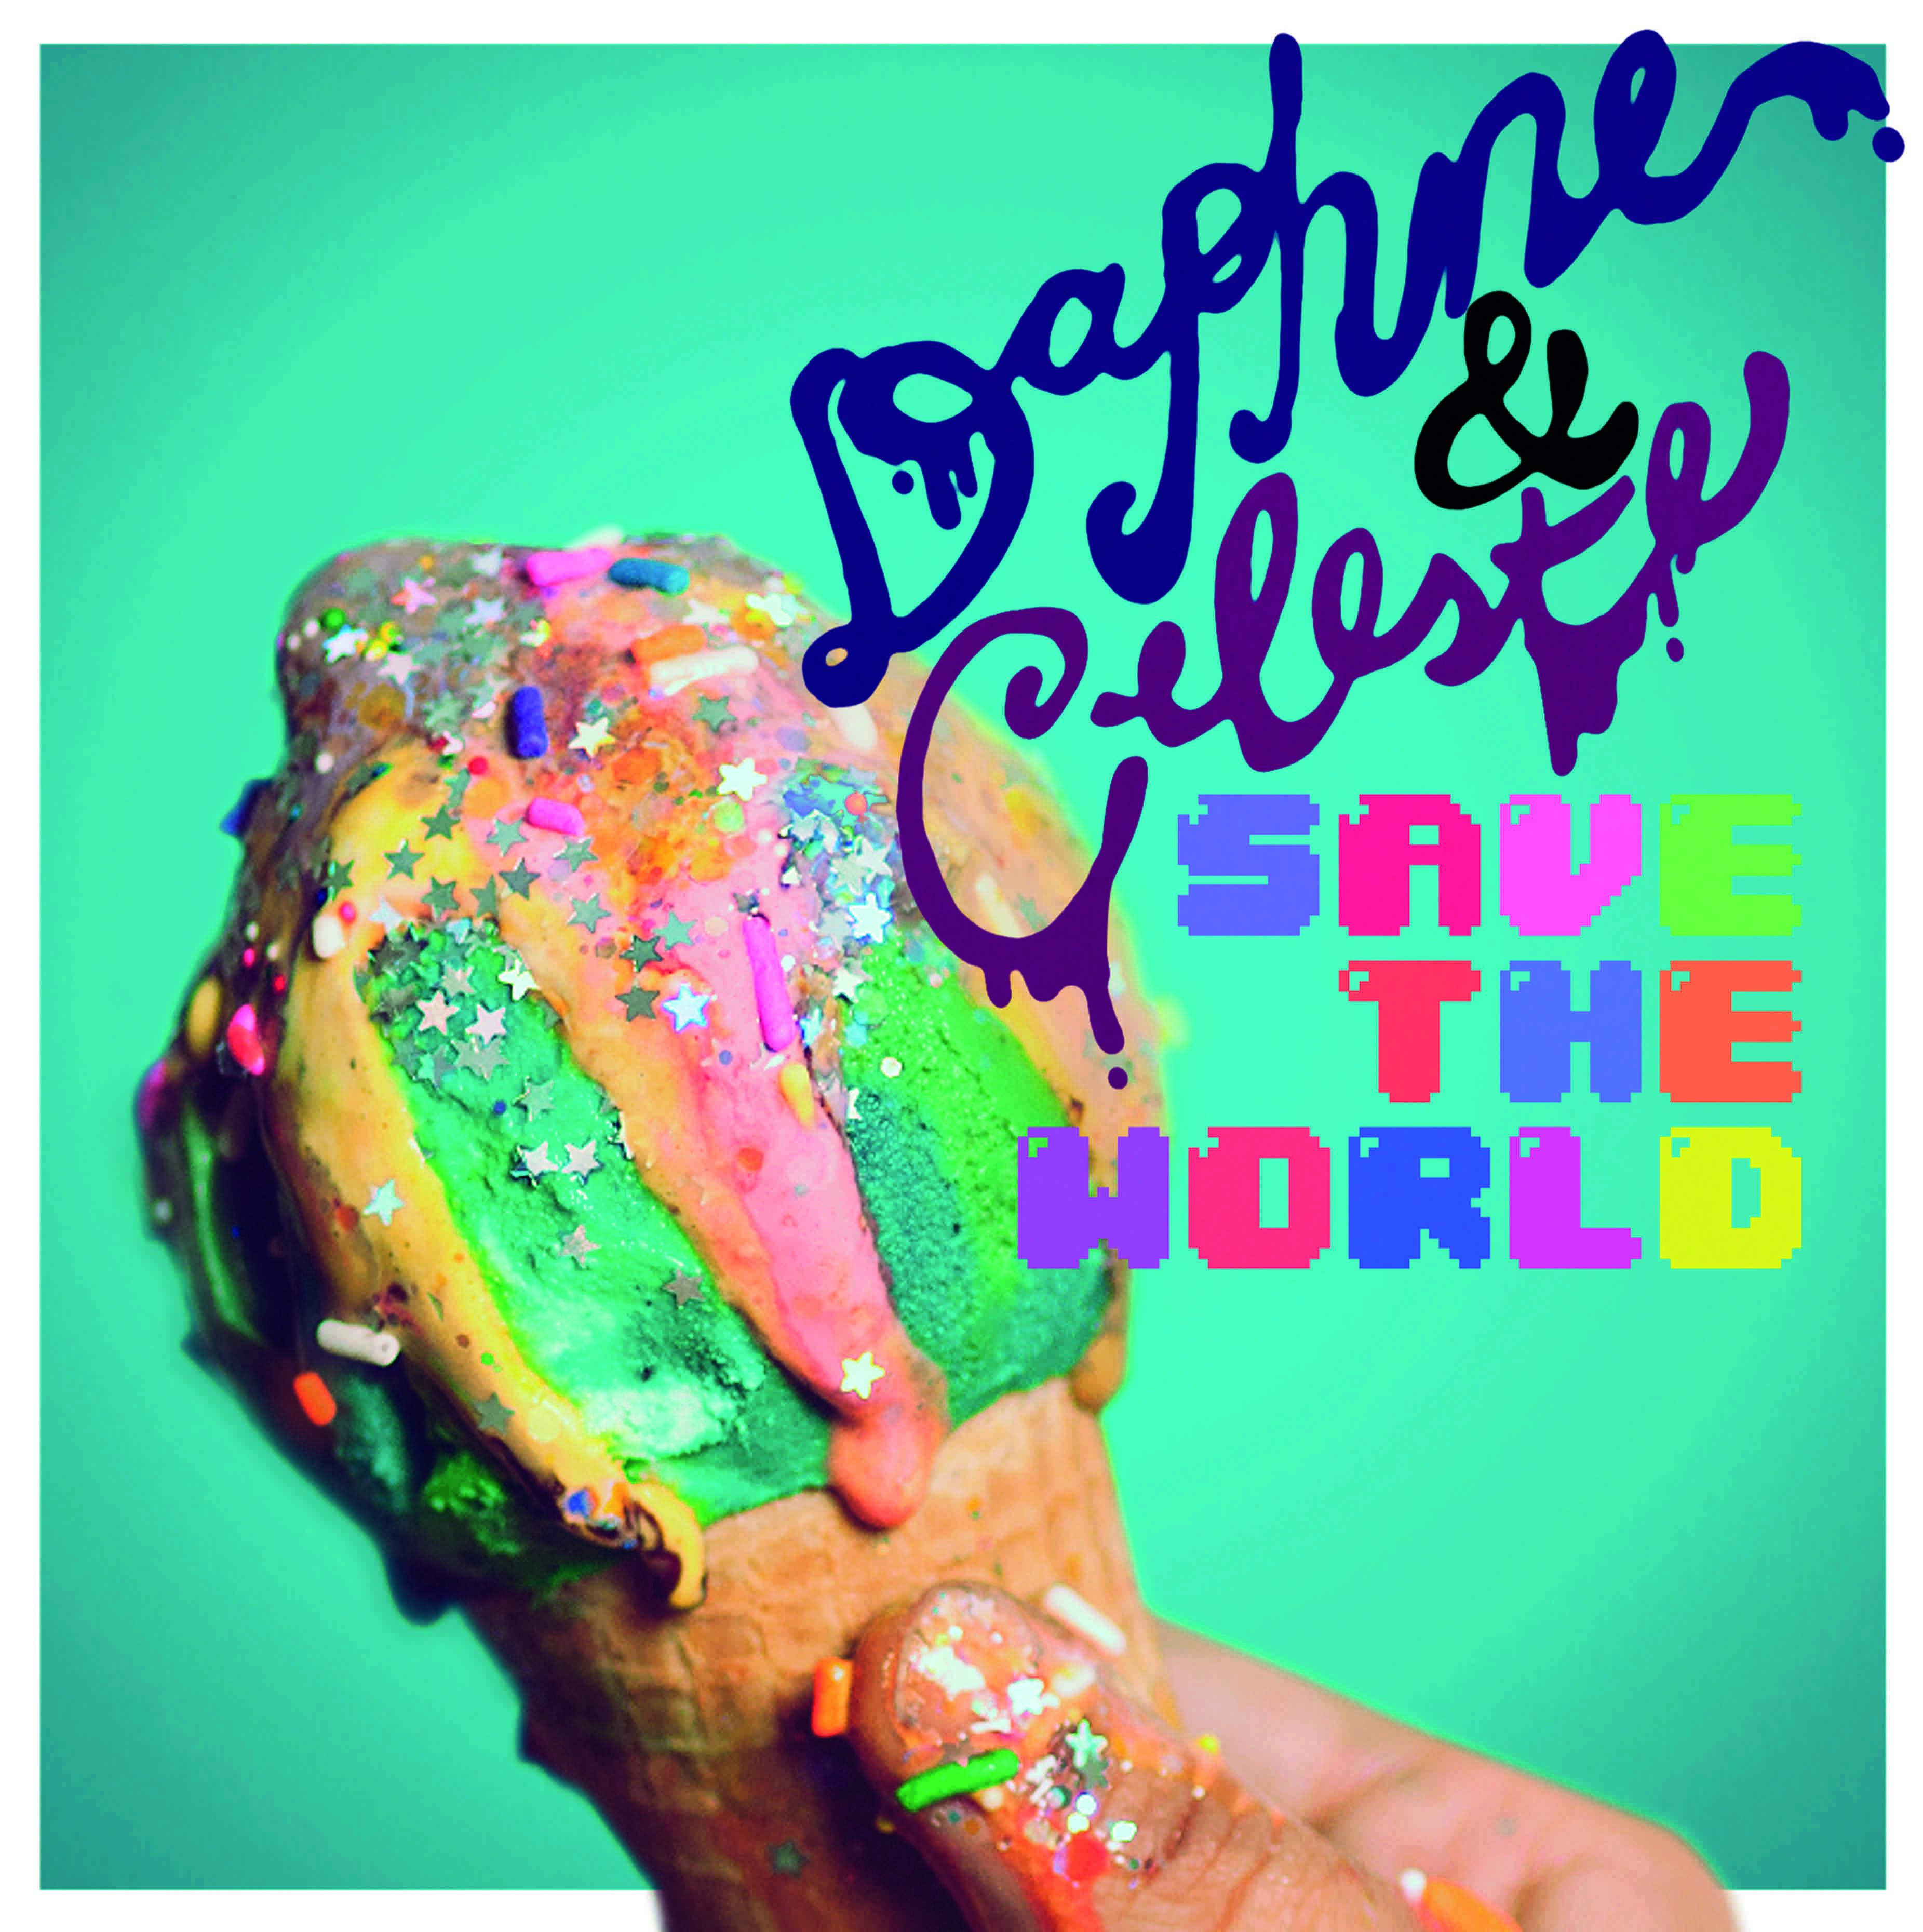 Girls Just Wanna Have Fun: Daphne & Celeste interview - Daphne & Celeste Save The World